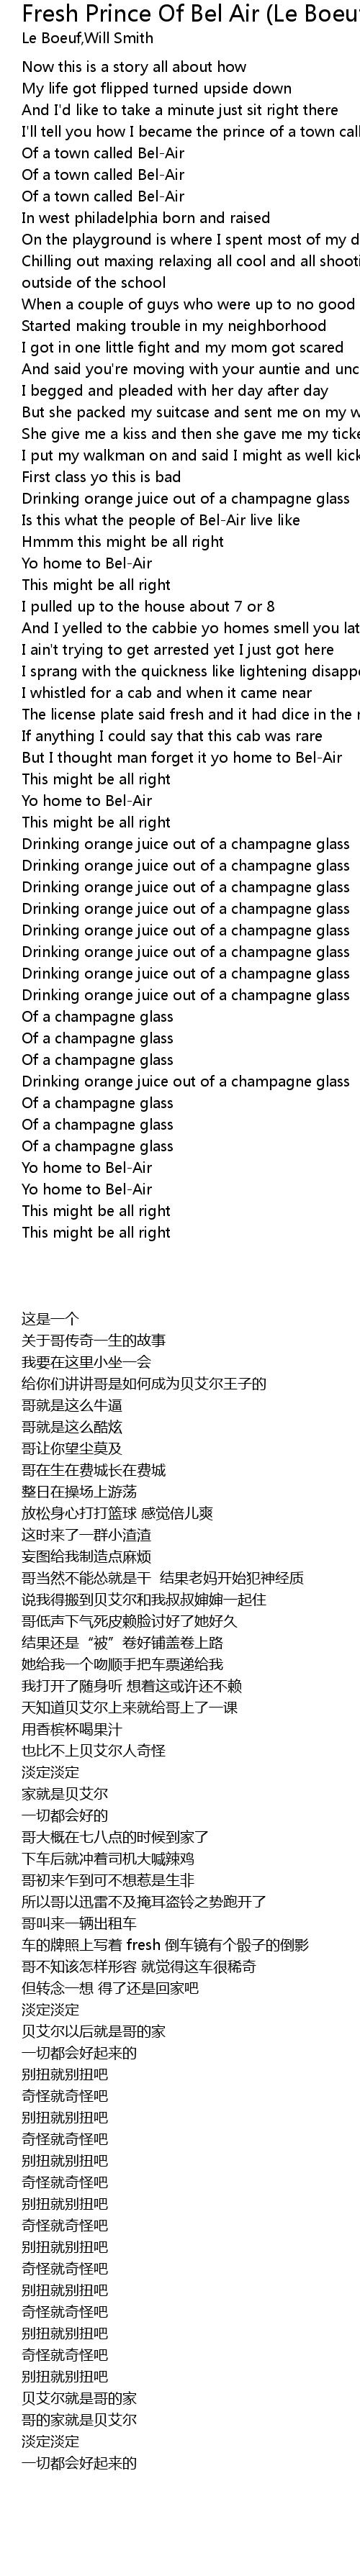 Fresh Prince Of Bel Air Le Boeuf Remix Lyrics   Follow Lyrics